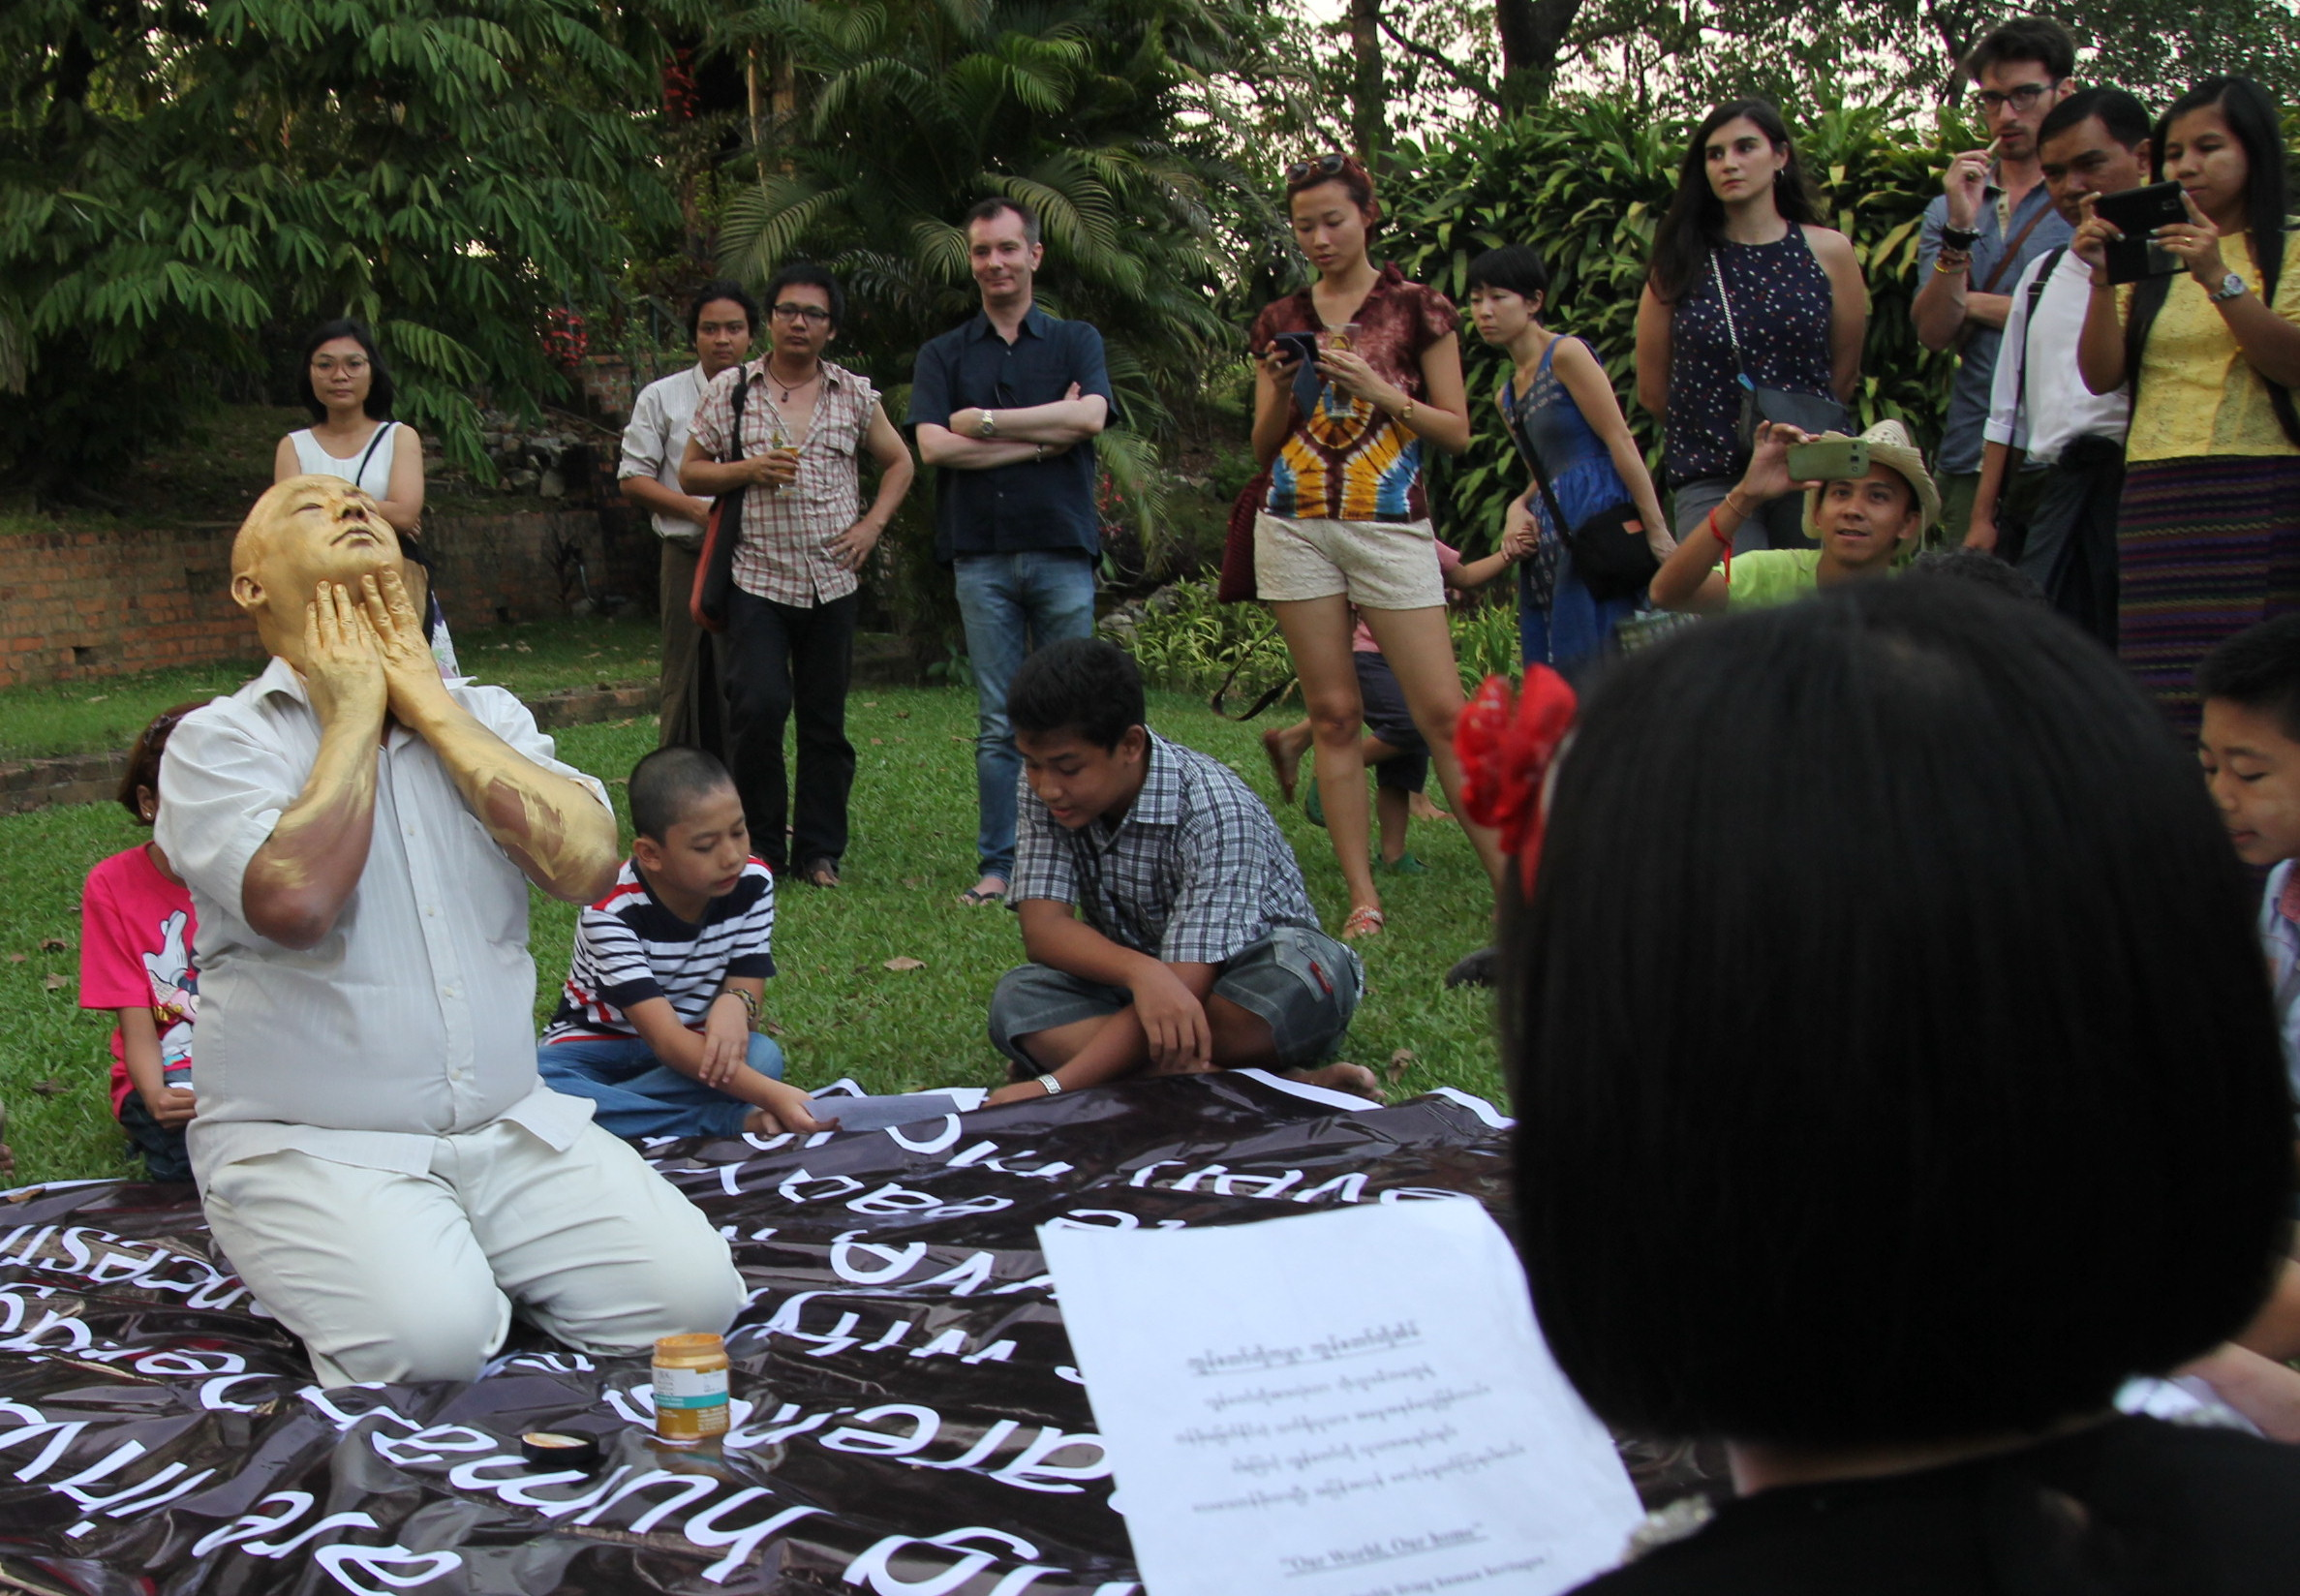 Performce by  Myat Kyaw |  Photo by Zarni Phyo